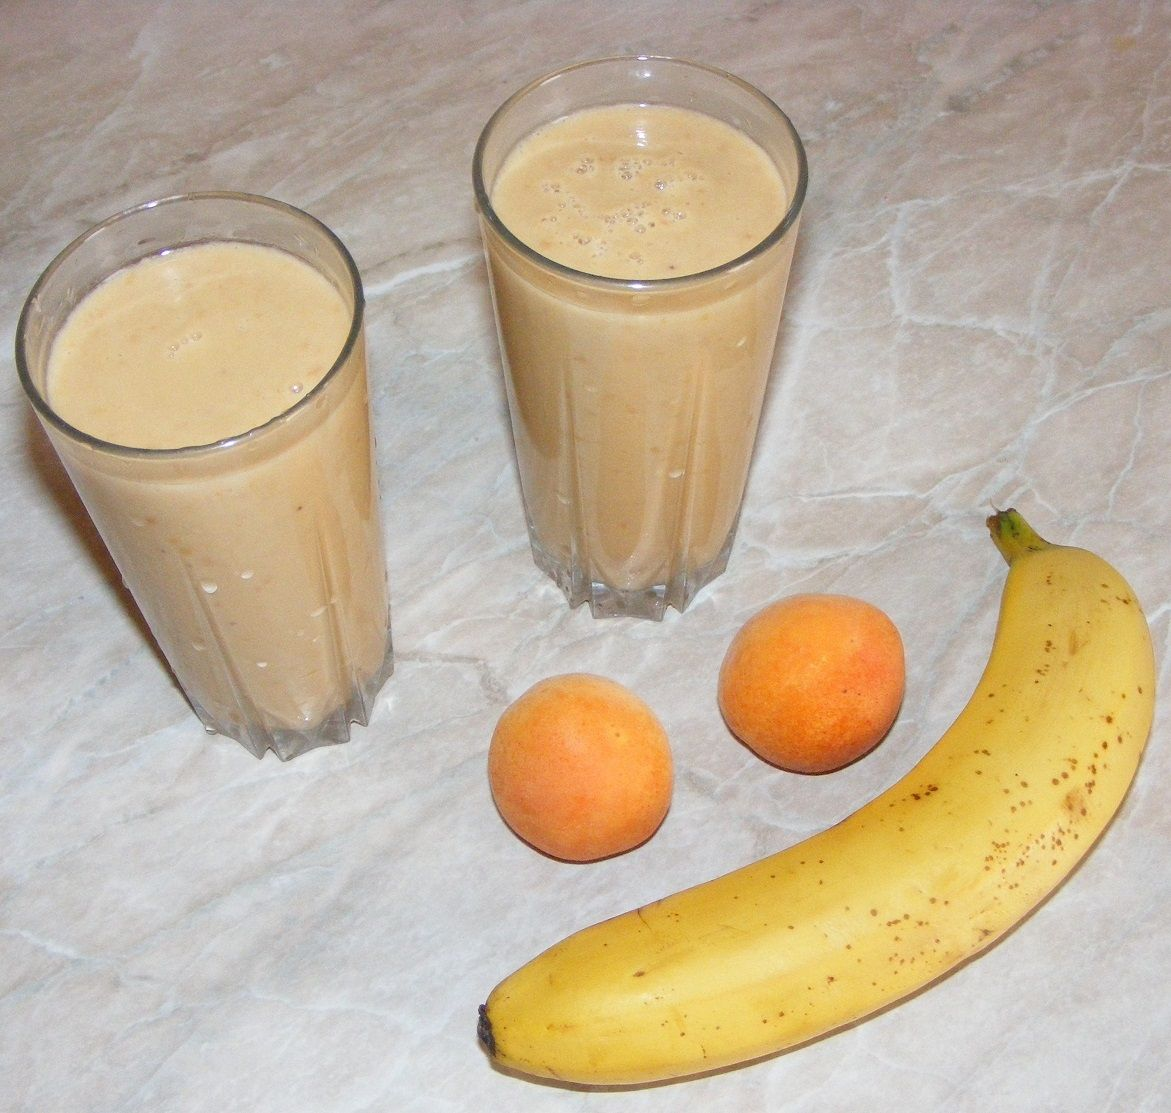 Apricot and banana milkshake